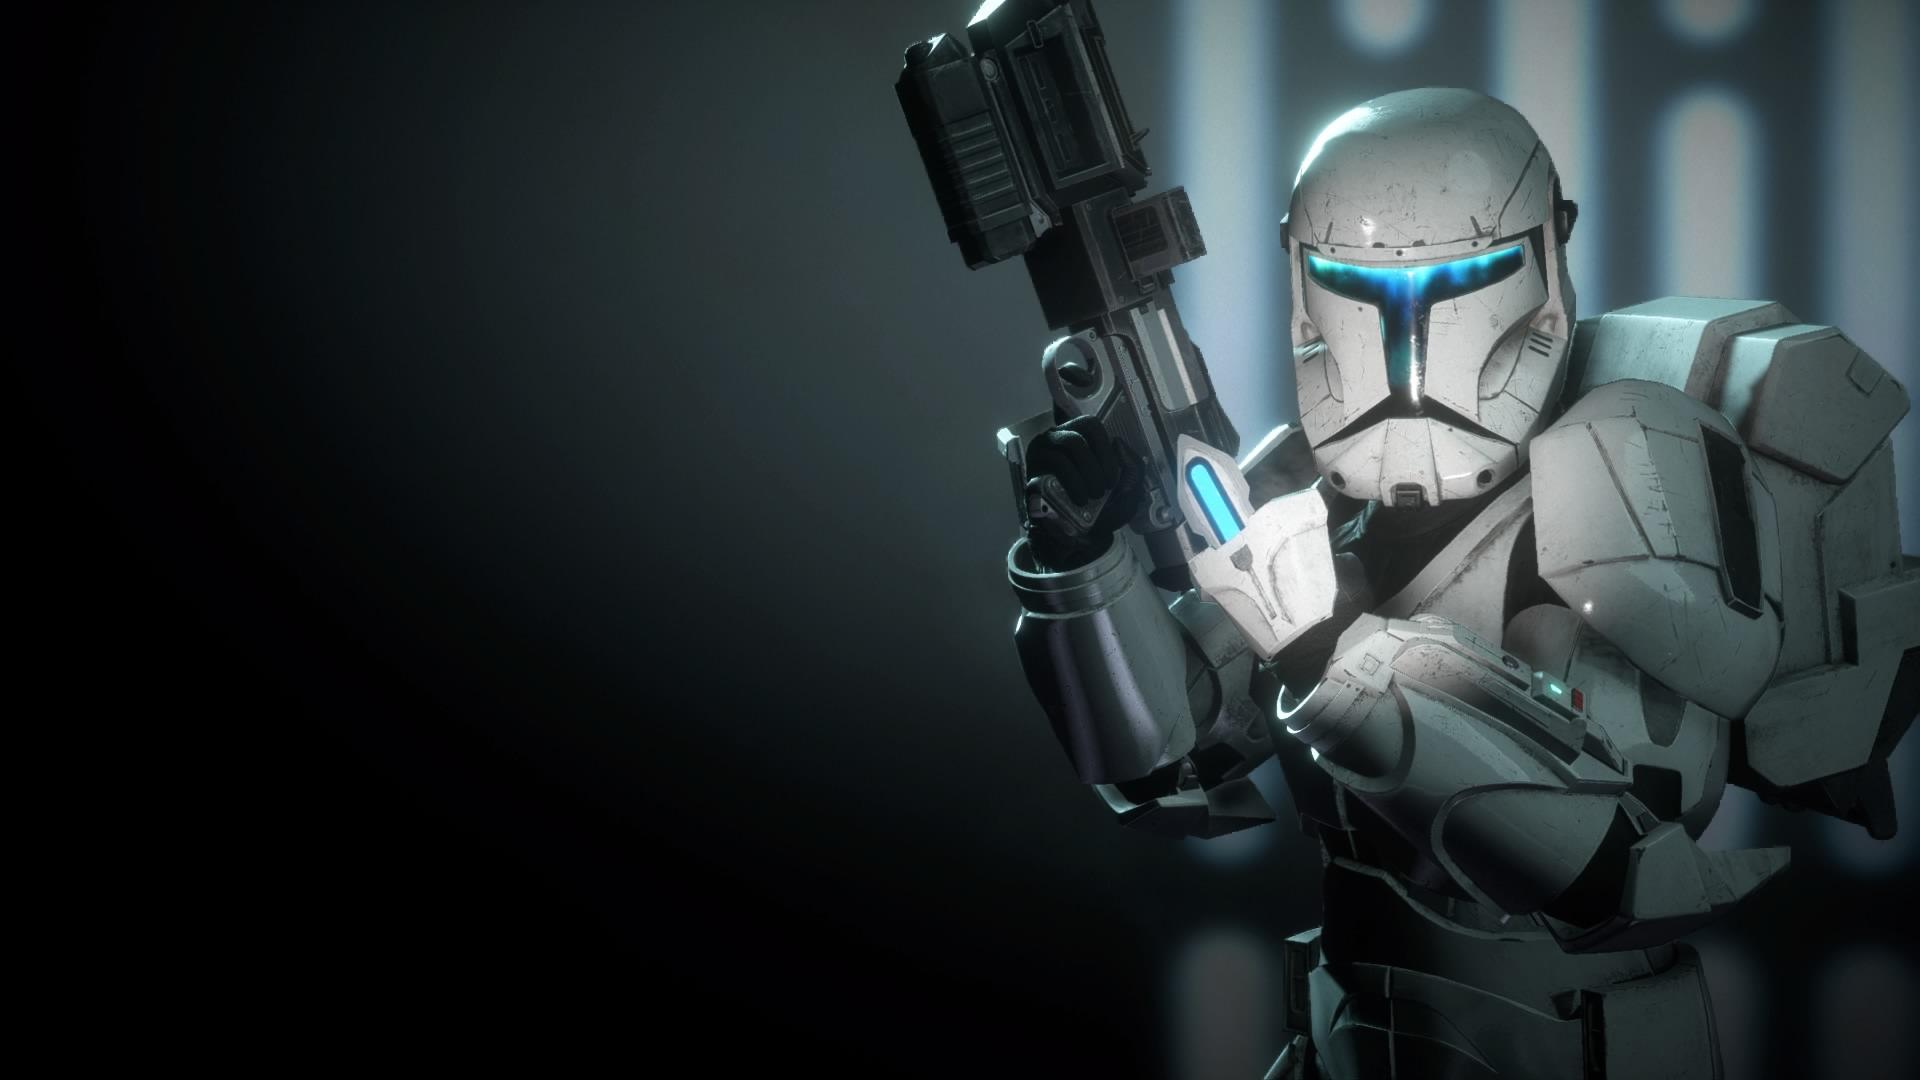 Star Wars Battlefront 2 Clone Commando Wallpaper By Bluemoh On Deviantart